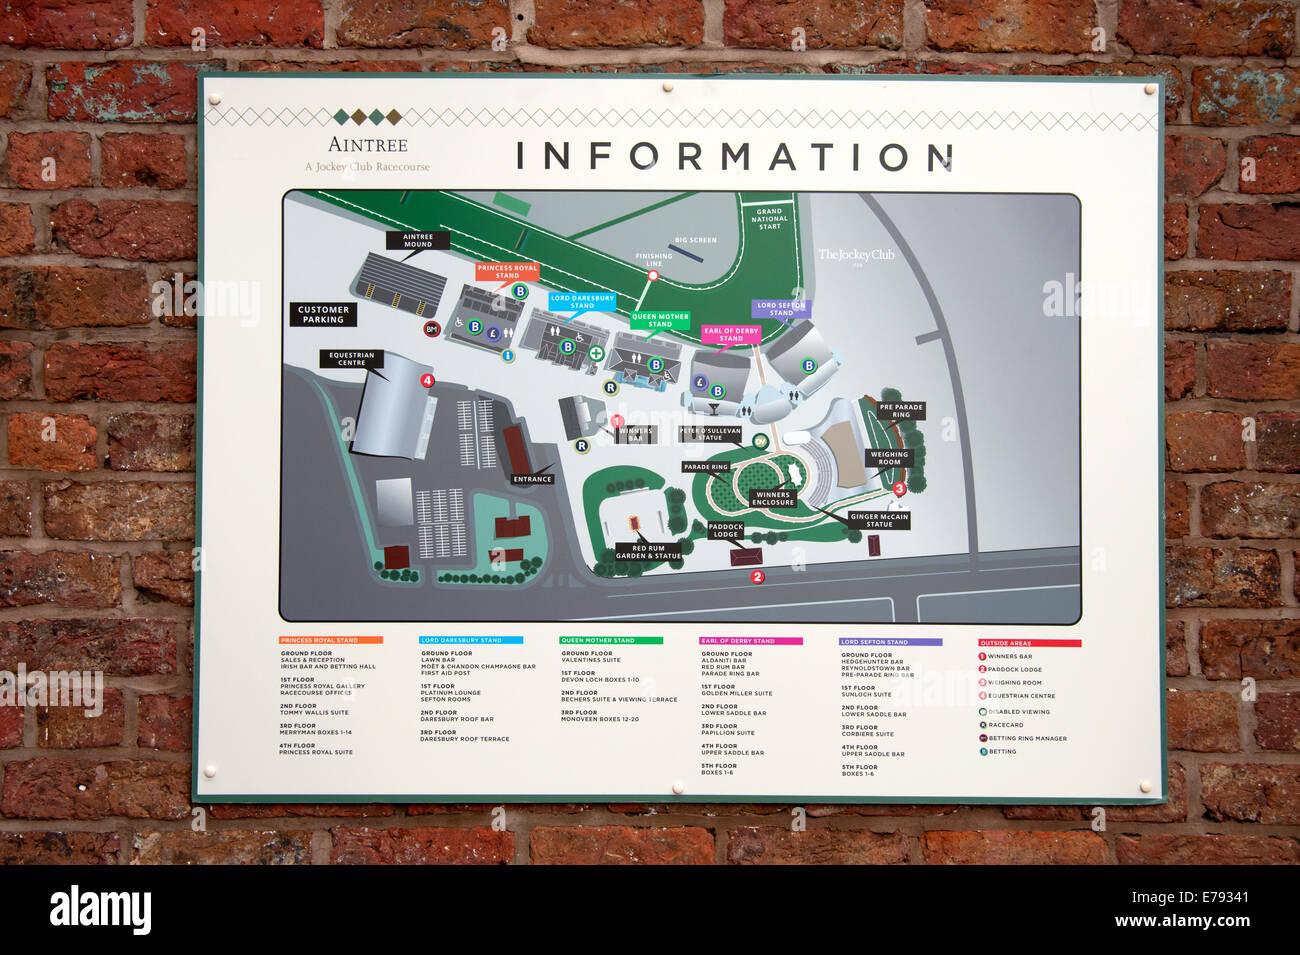 Aintree Racecourse Liverpool Plan Layout Map Info Stock Photo